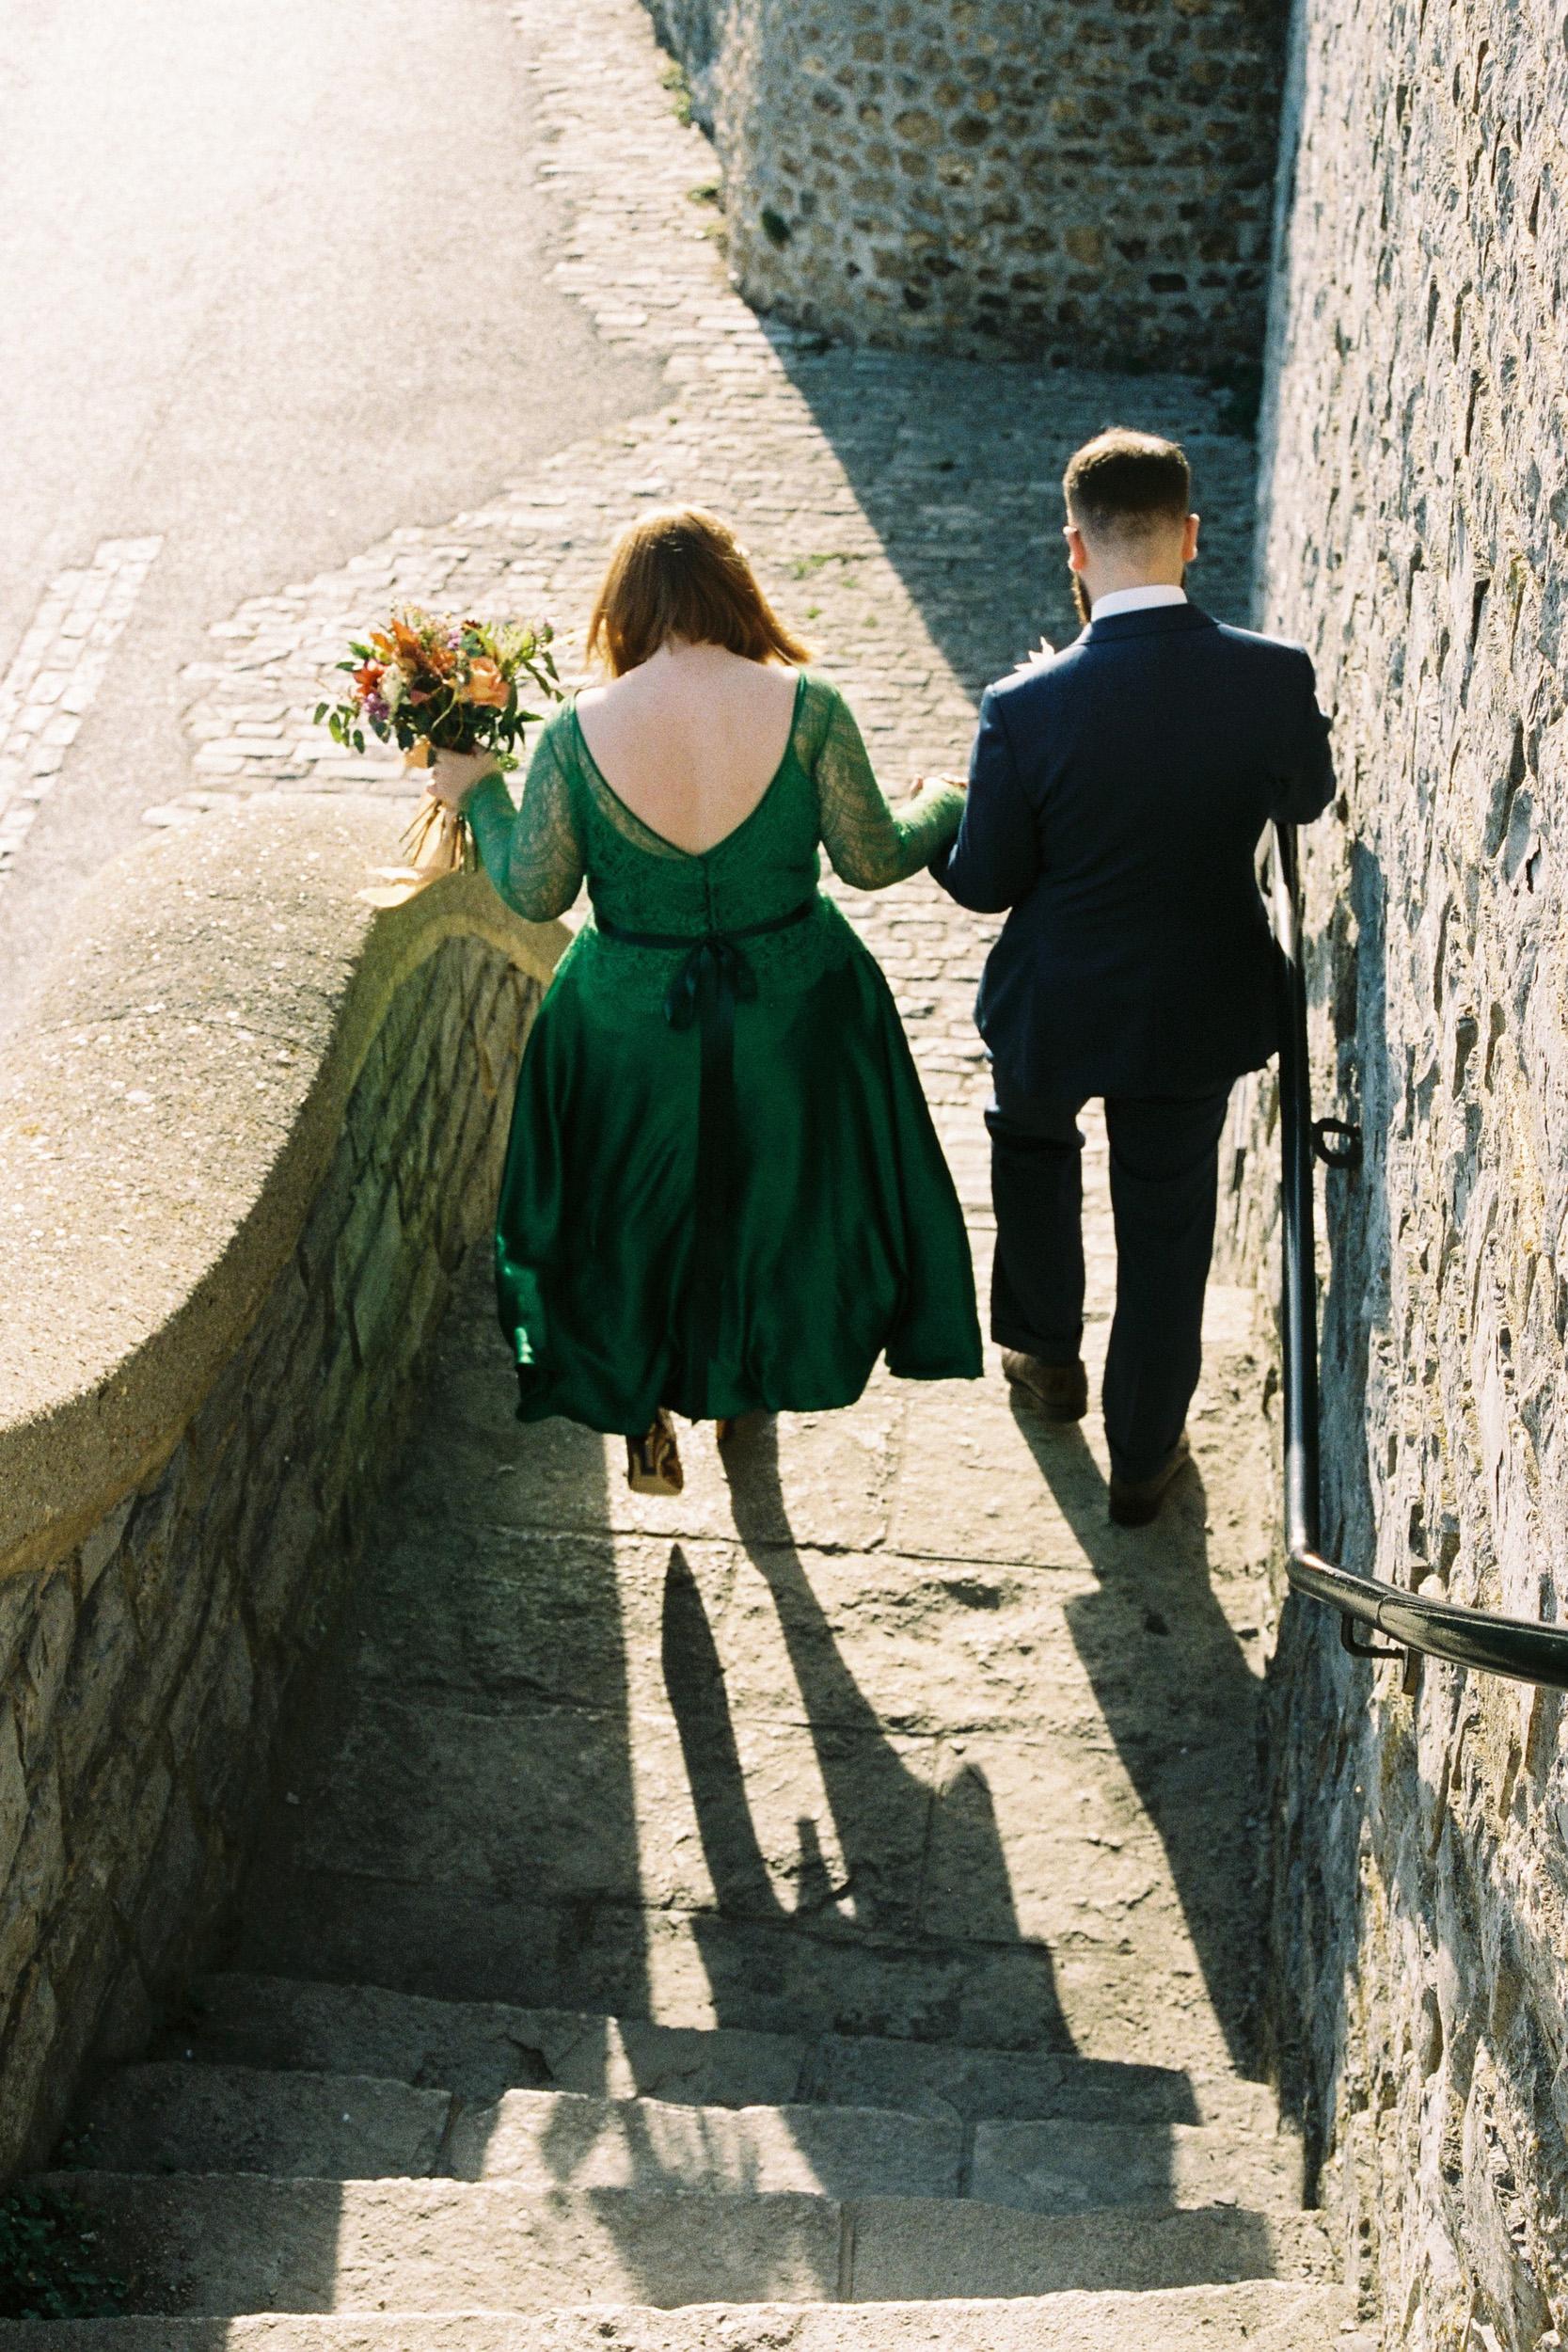 Lucy-Bespoke-Green-Silk-Lace-Wedding-Dress-Kate-Beaumont-Sheffield-14.jpg